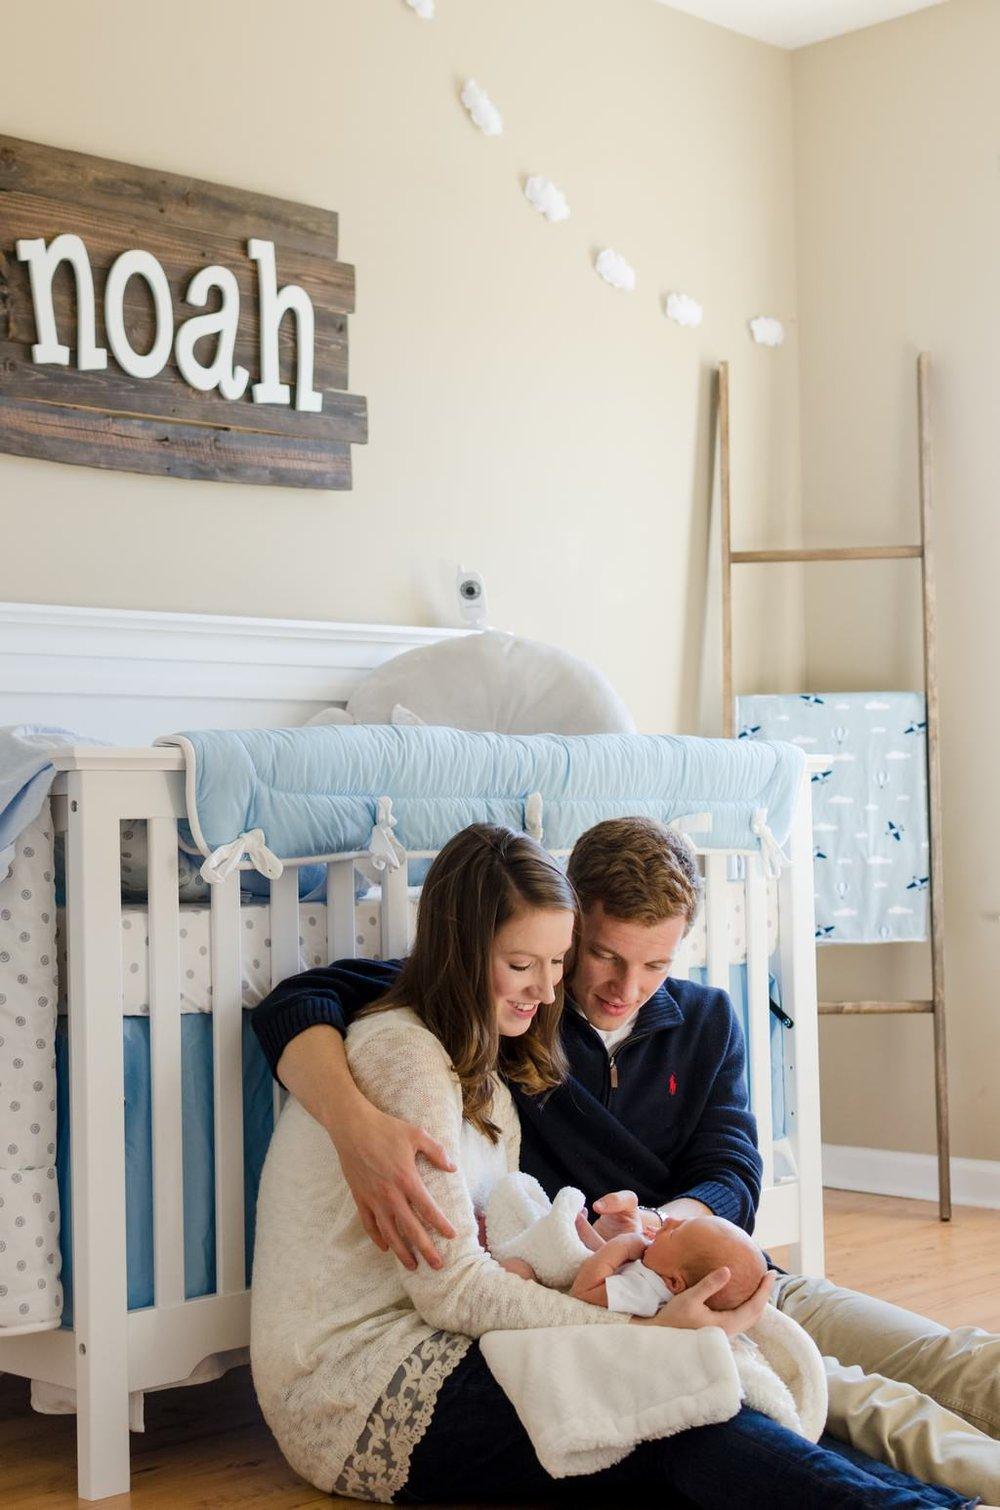 Noah-In-Home-Lifestyle-Newborn-Session-Murfreesboro-Nashville-Photographers+16